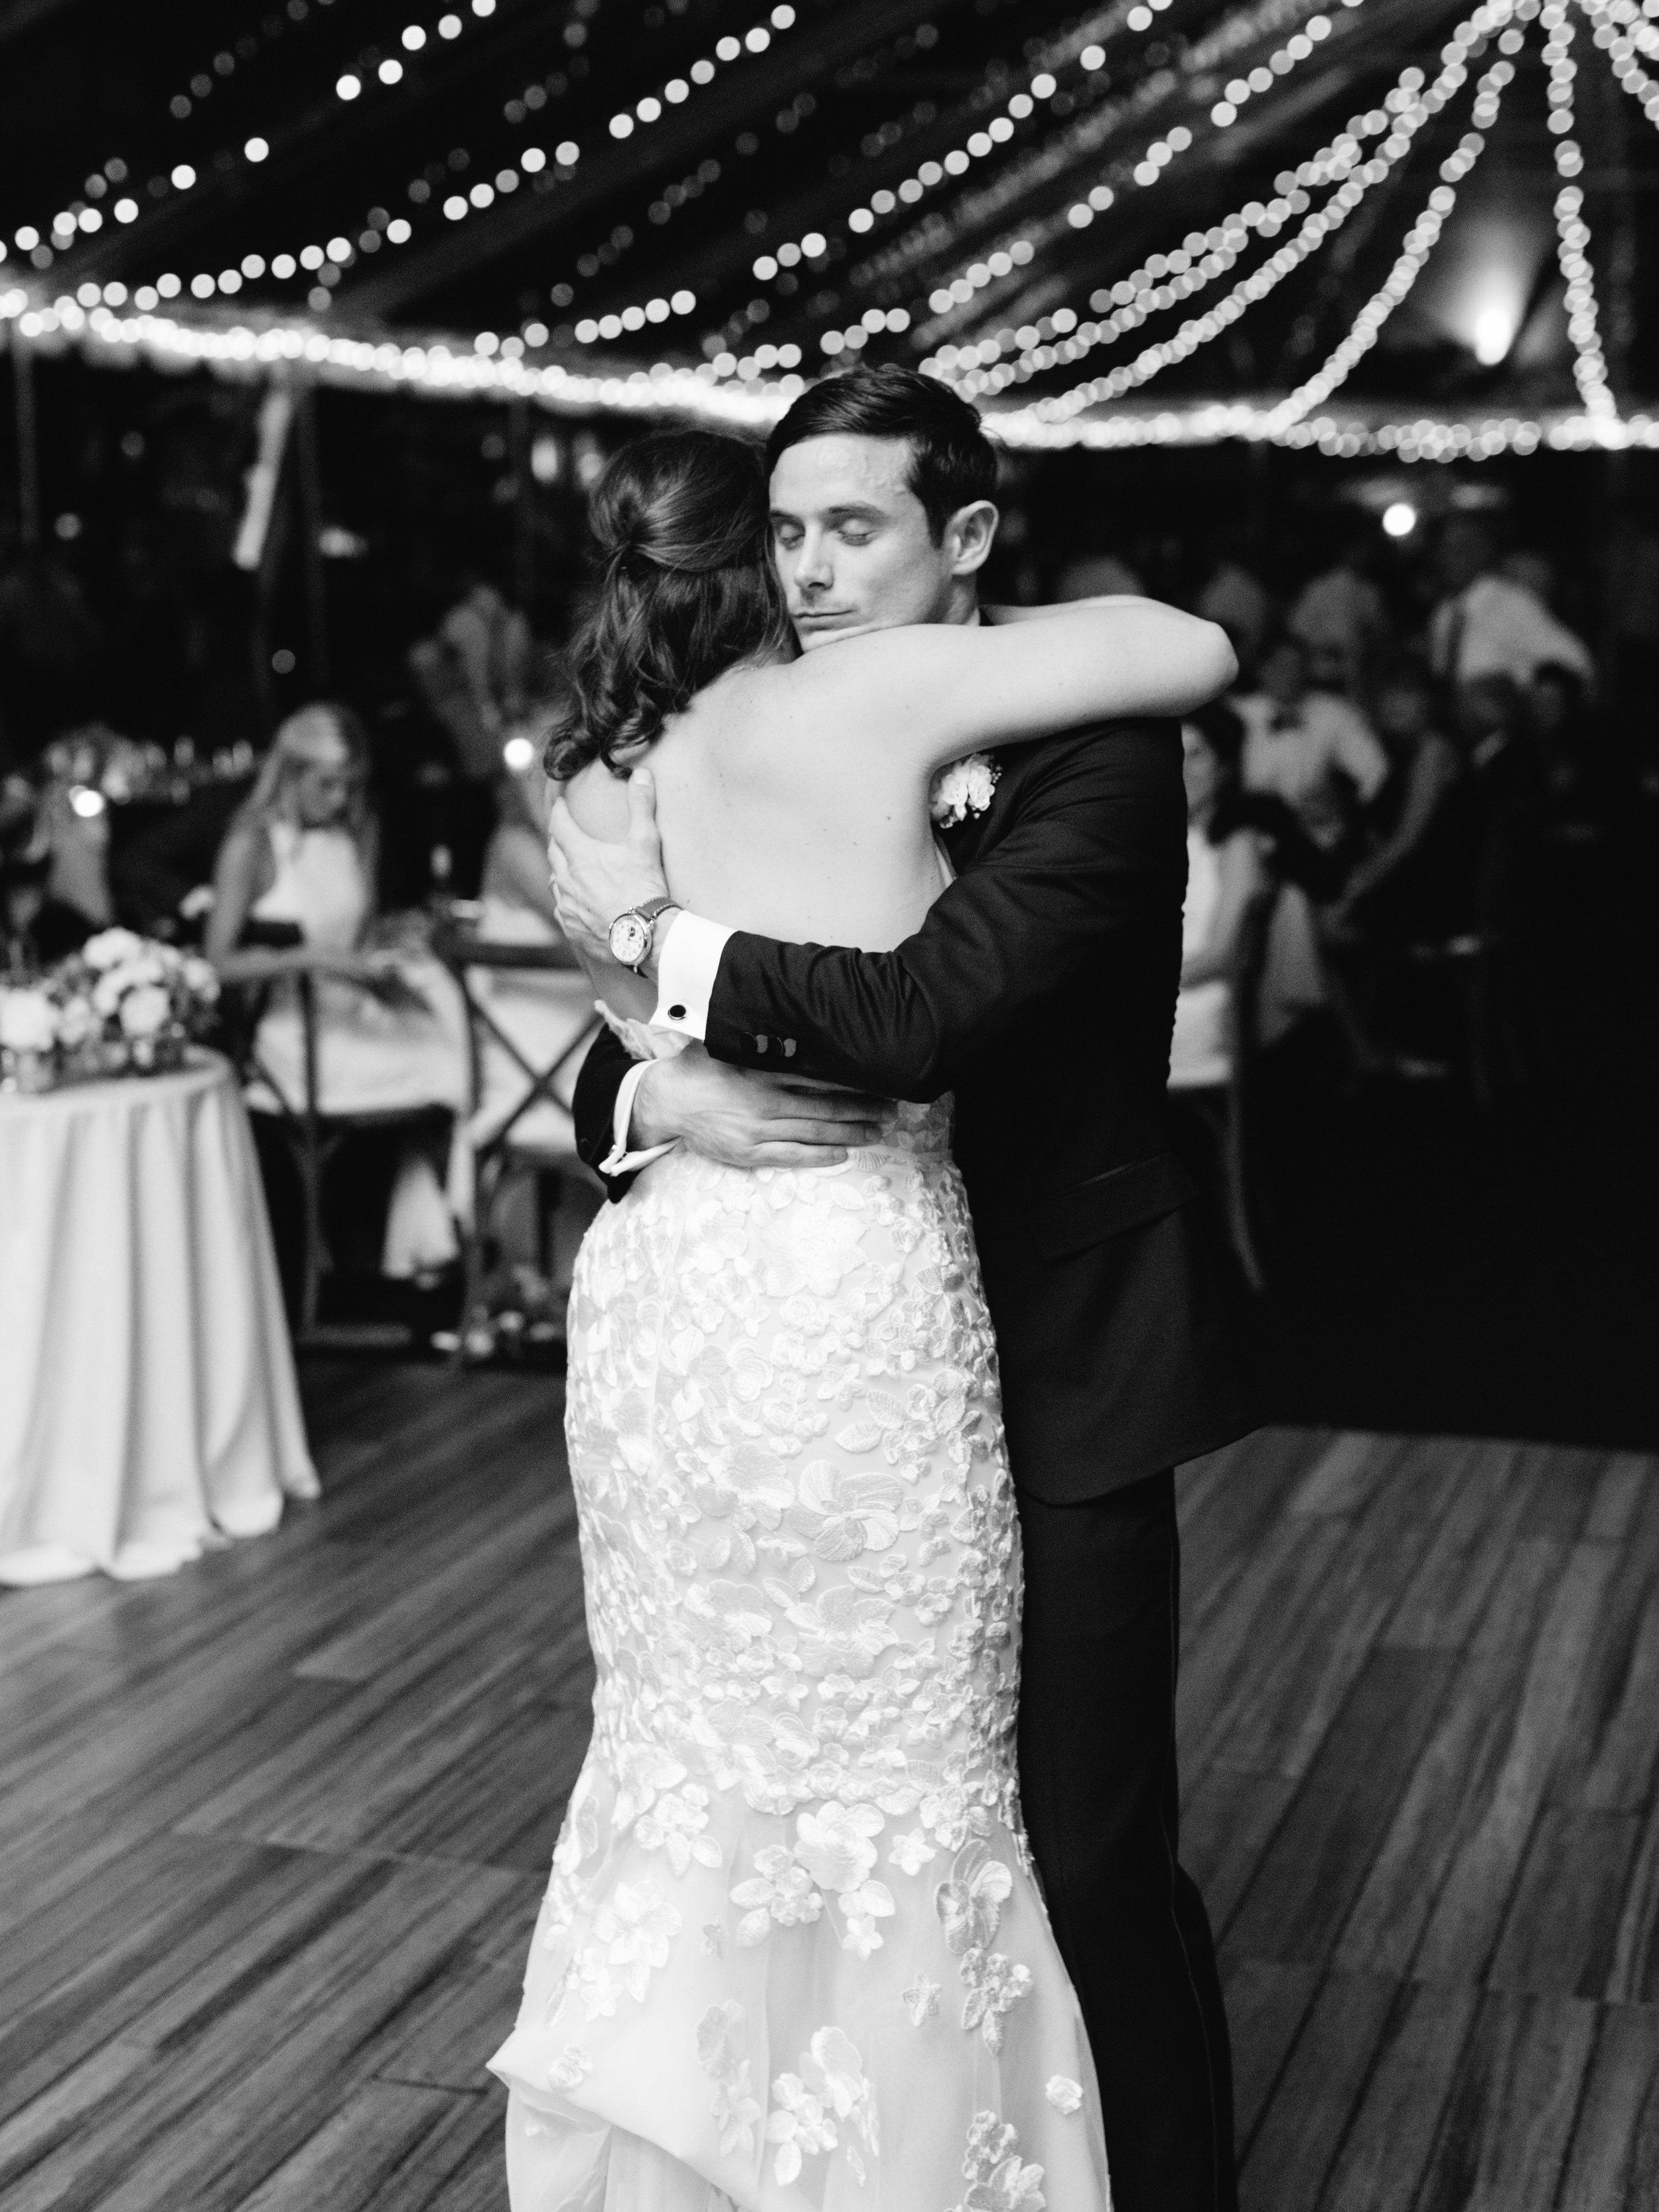 Kyle John l Fine Art Wedding Photography l Chicago, Copenhagen, California, New York, Destination l Blog l Kate and Michael_Winnetka_43